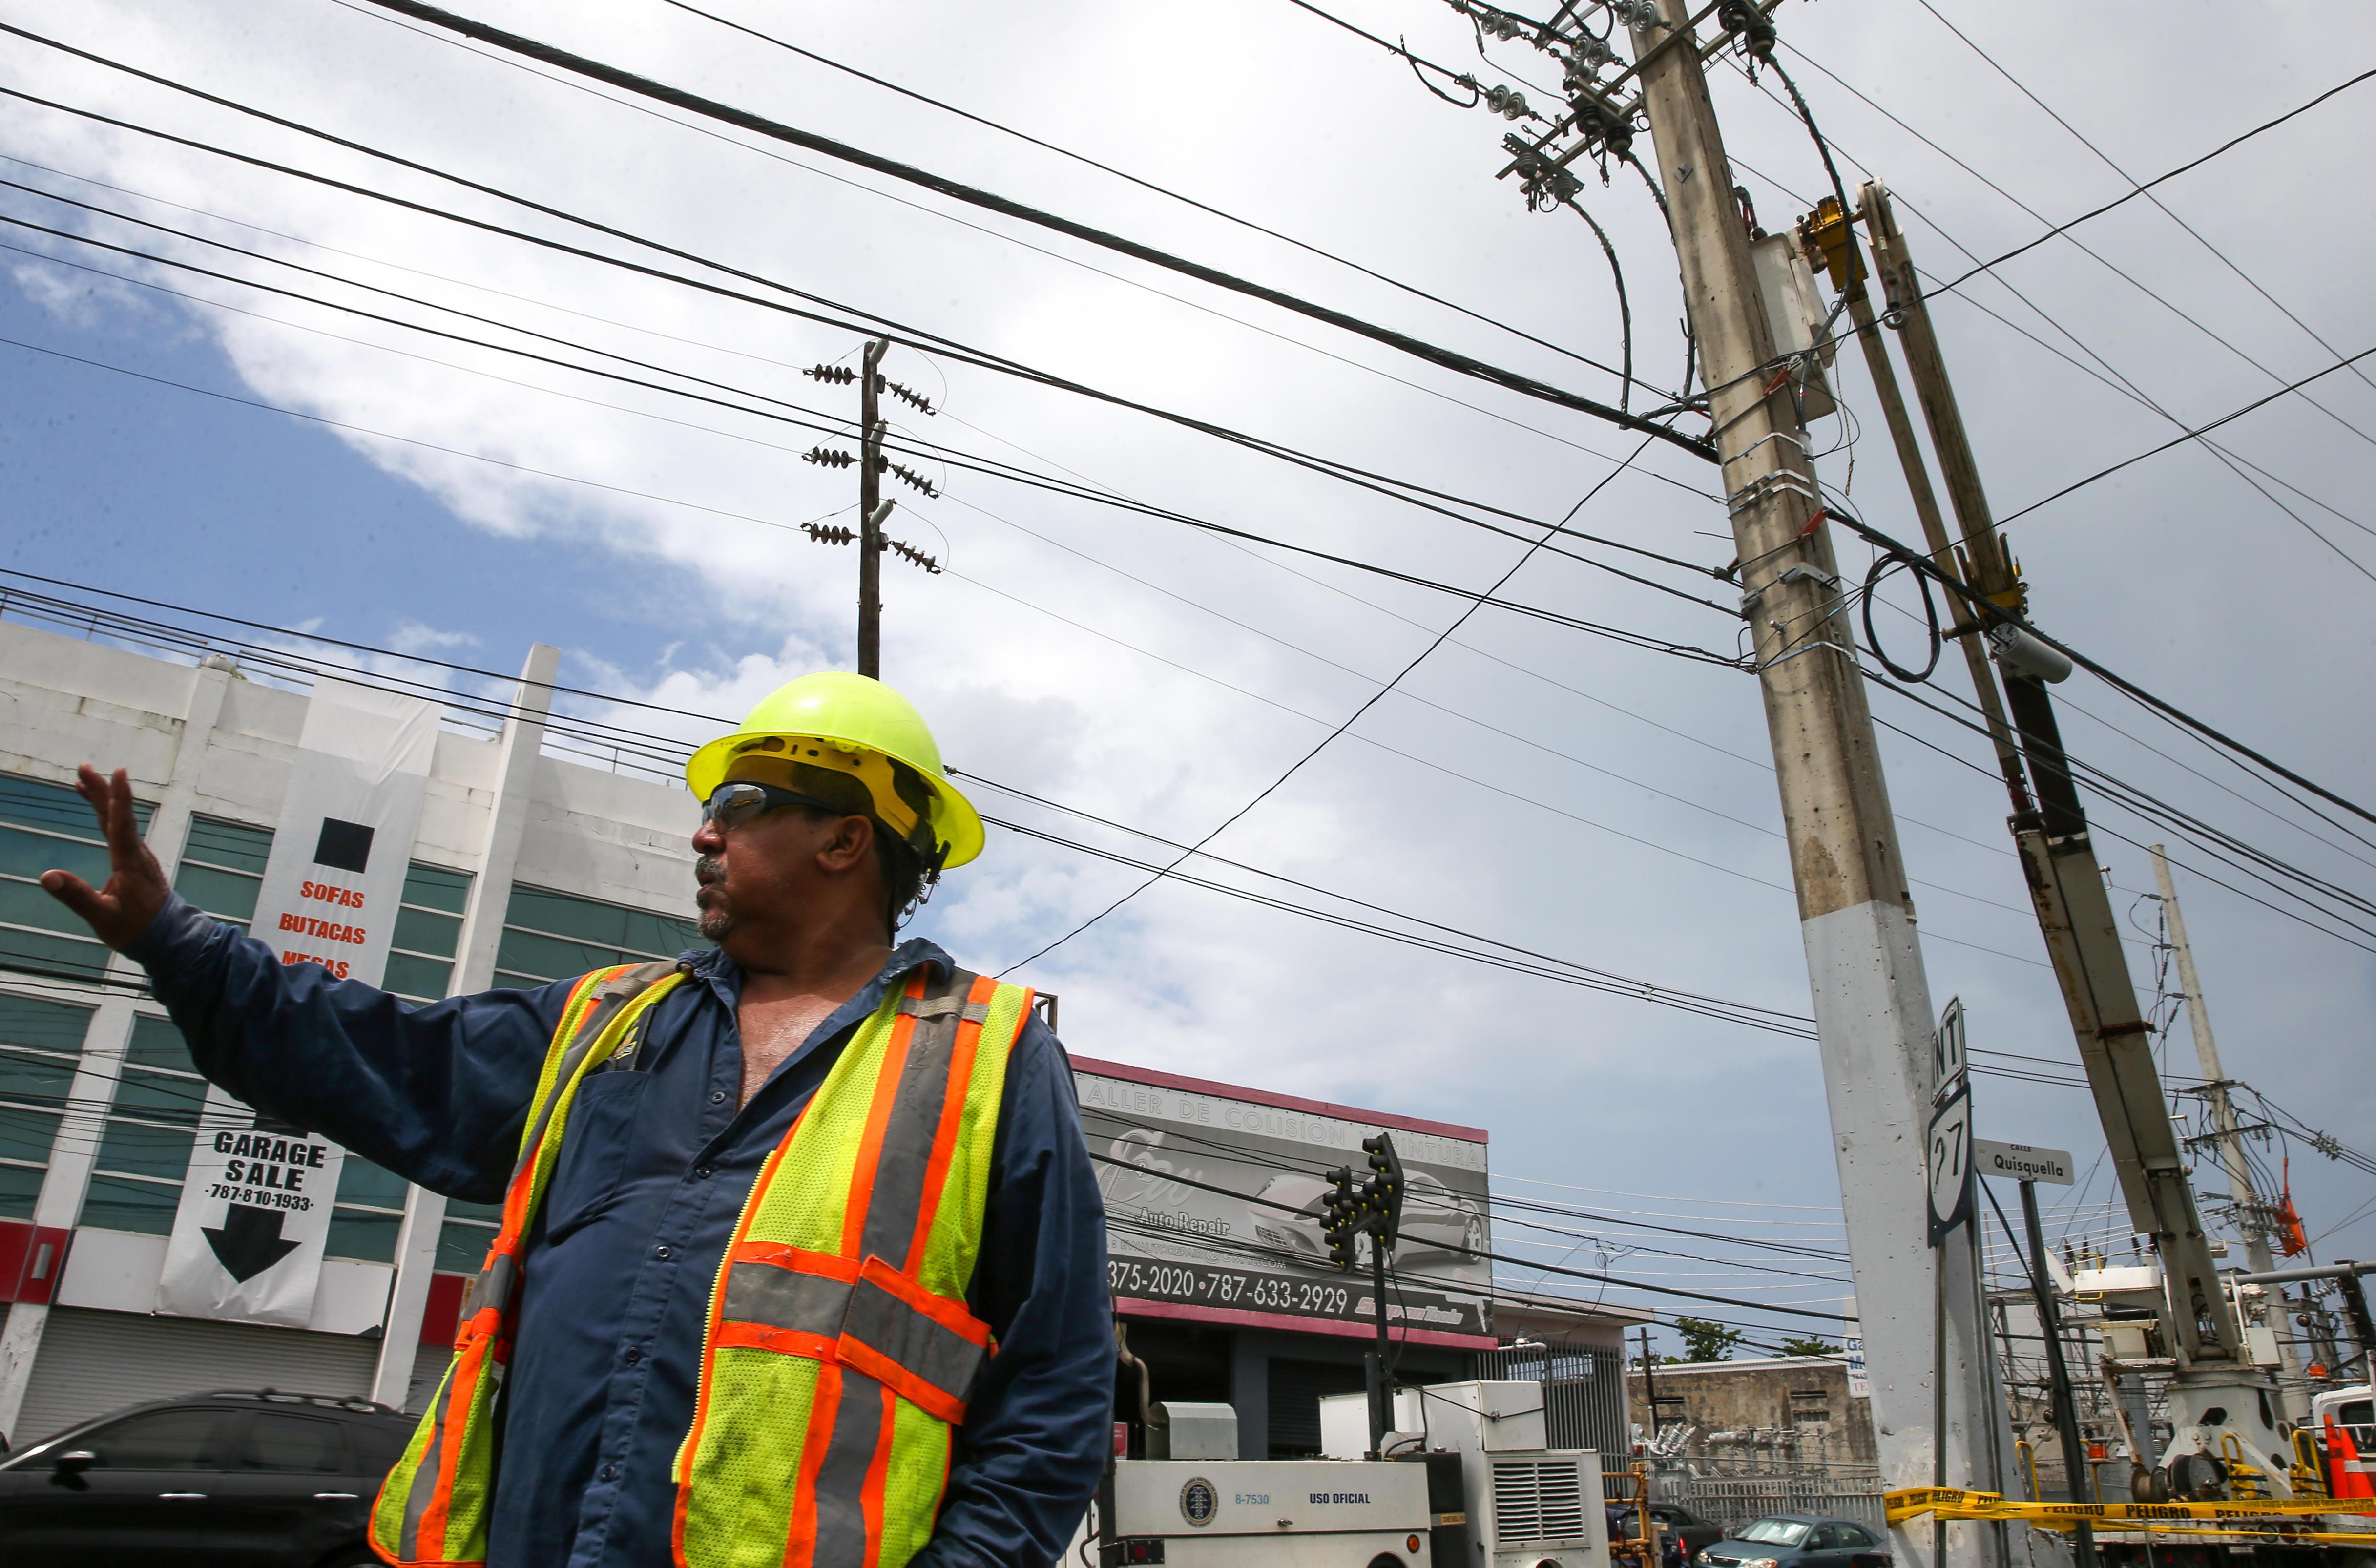 Turmoil slows rebuilding of Puerto Rico s power grid - CBS News 3c0ddf6072f3